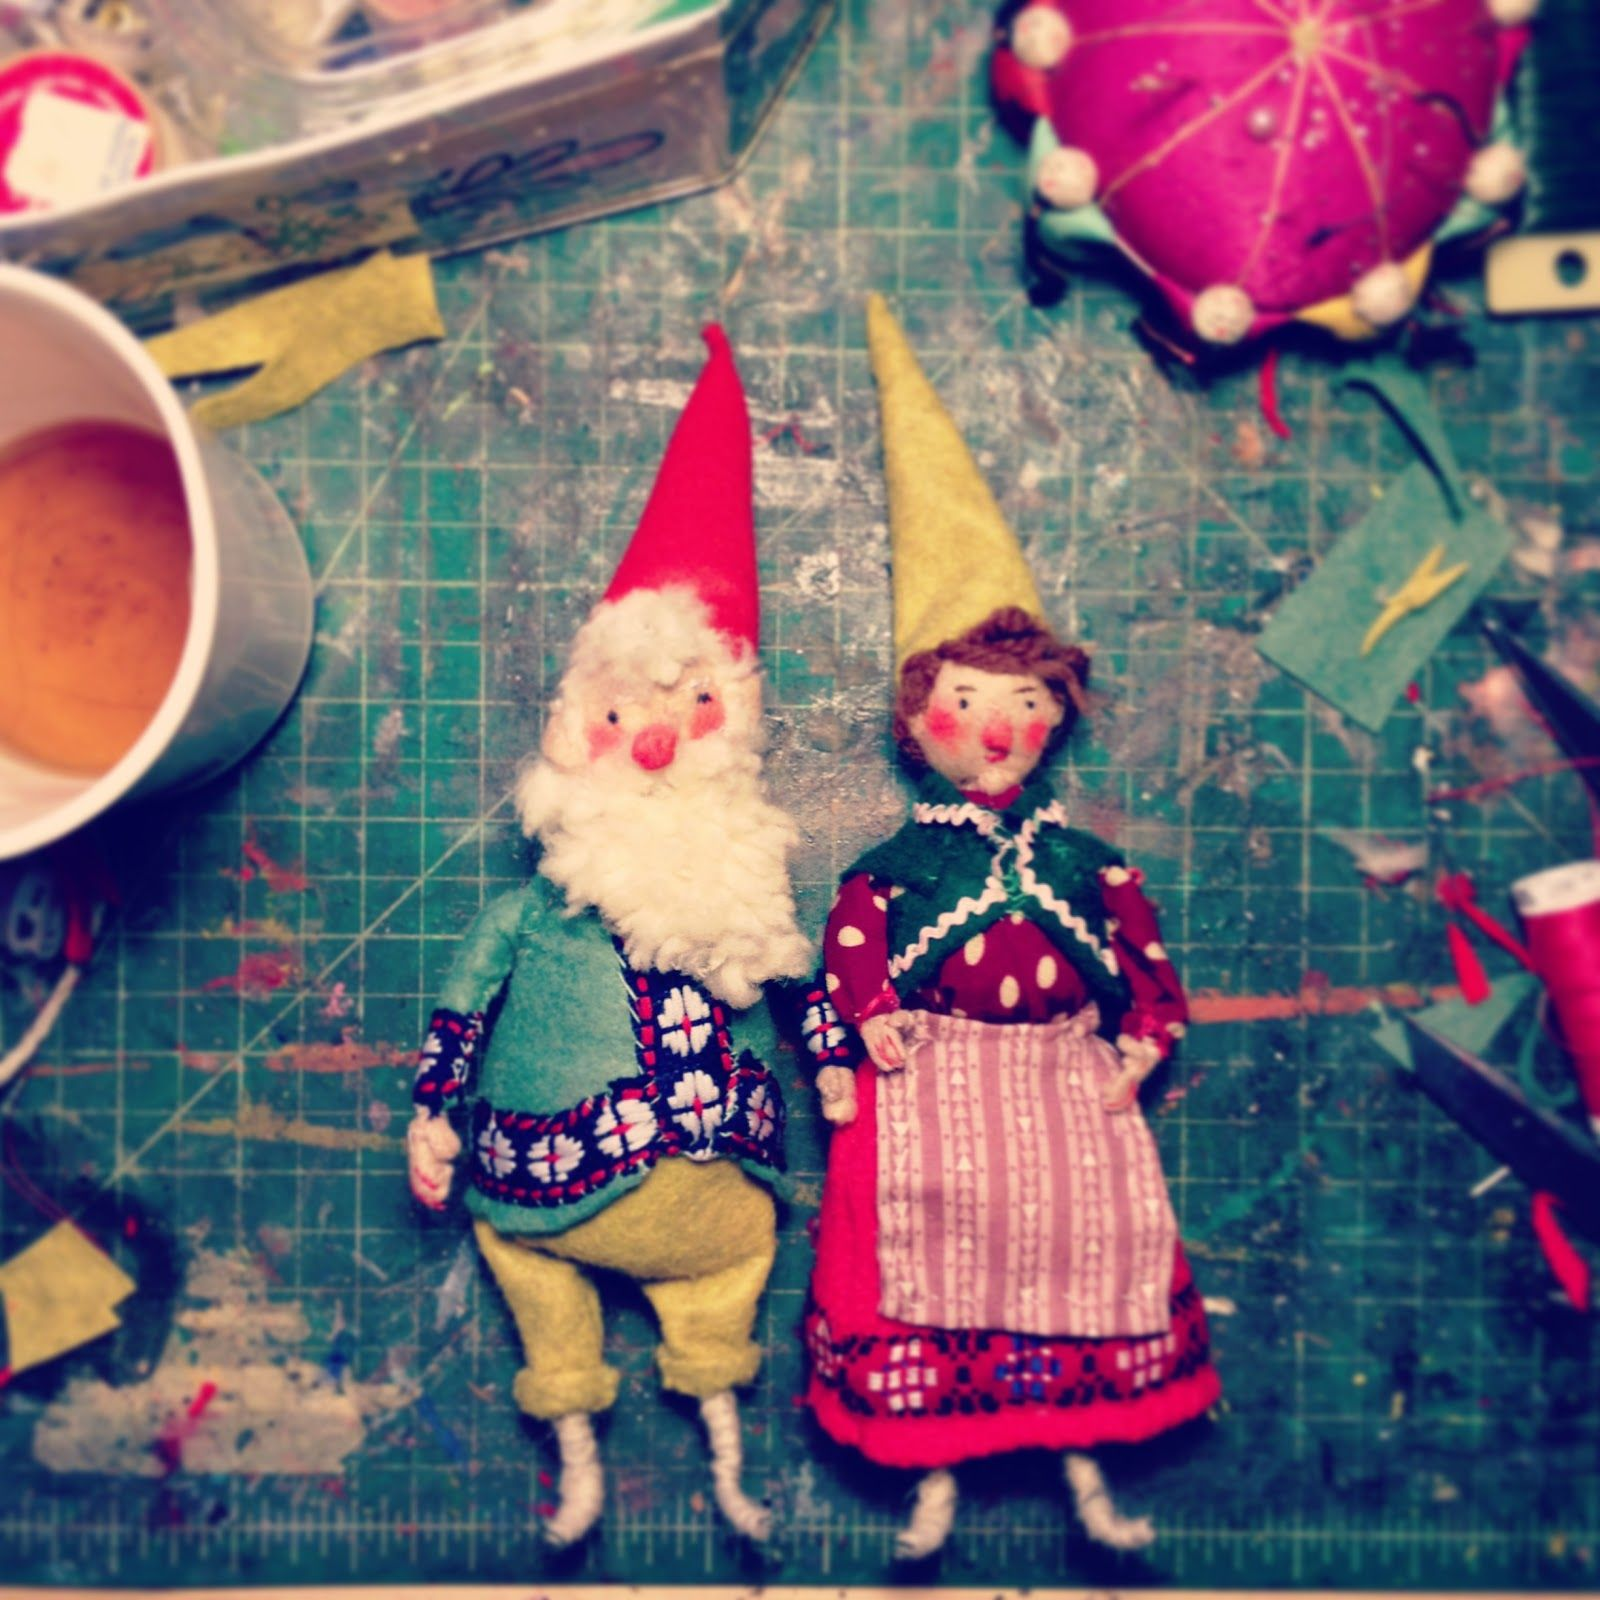 PHOEBE WAHL Dolls handmade, Kitsch christmas, Kids